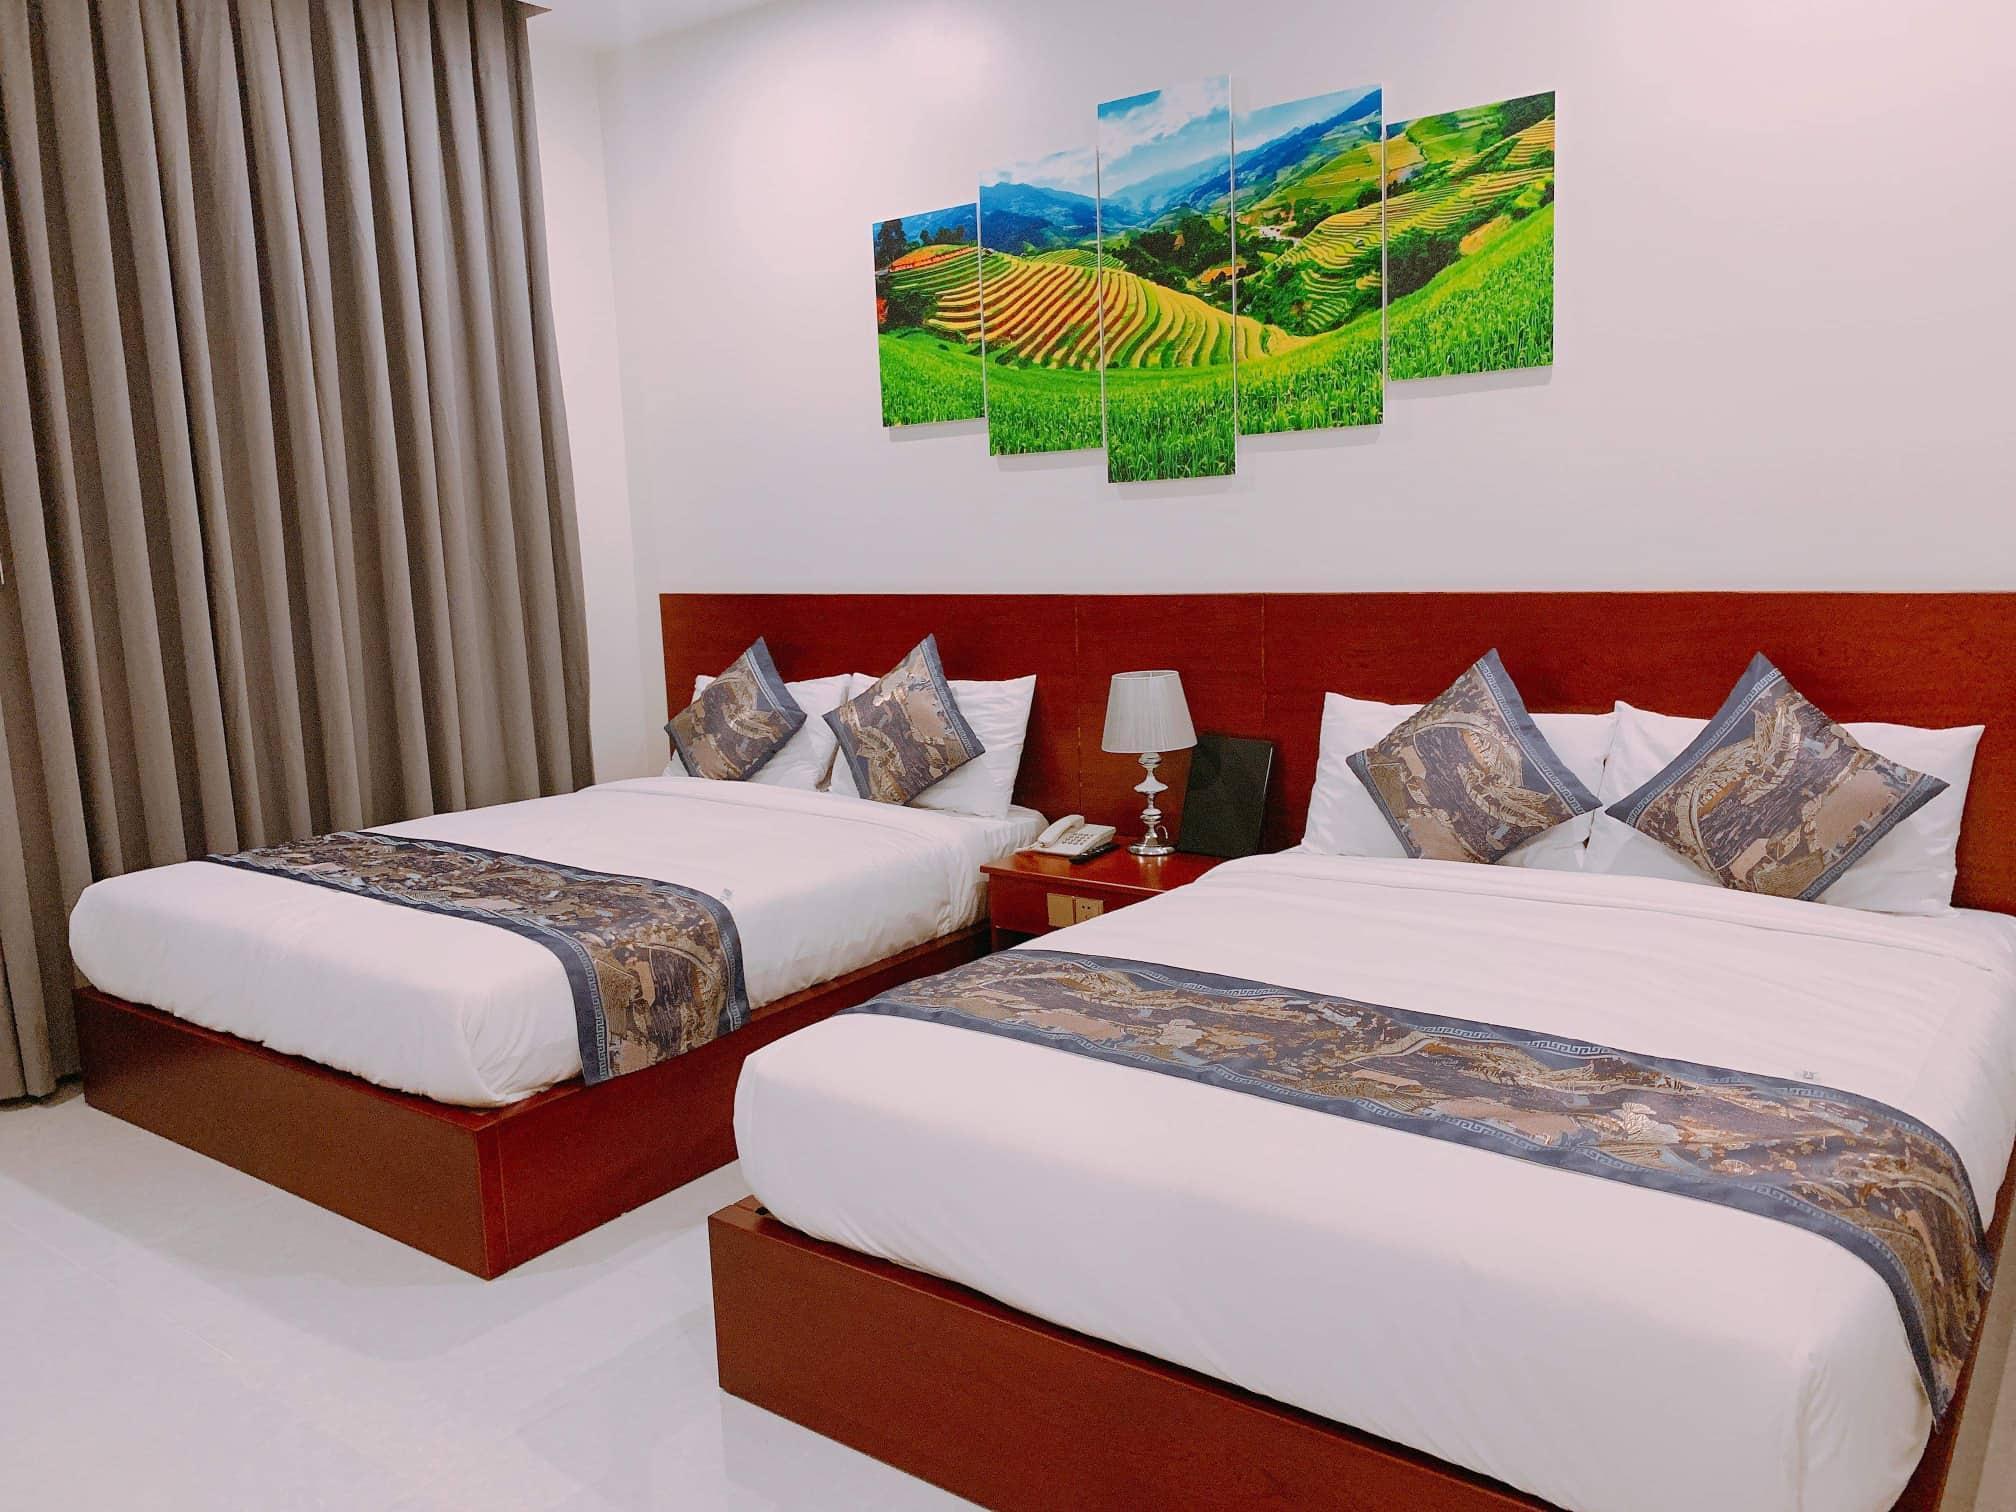 Royal Hotel Bac Lieu